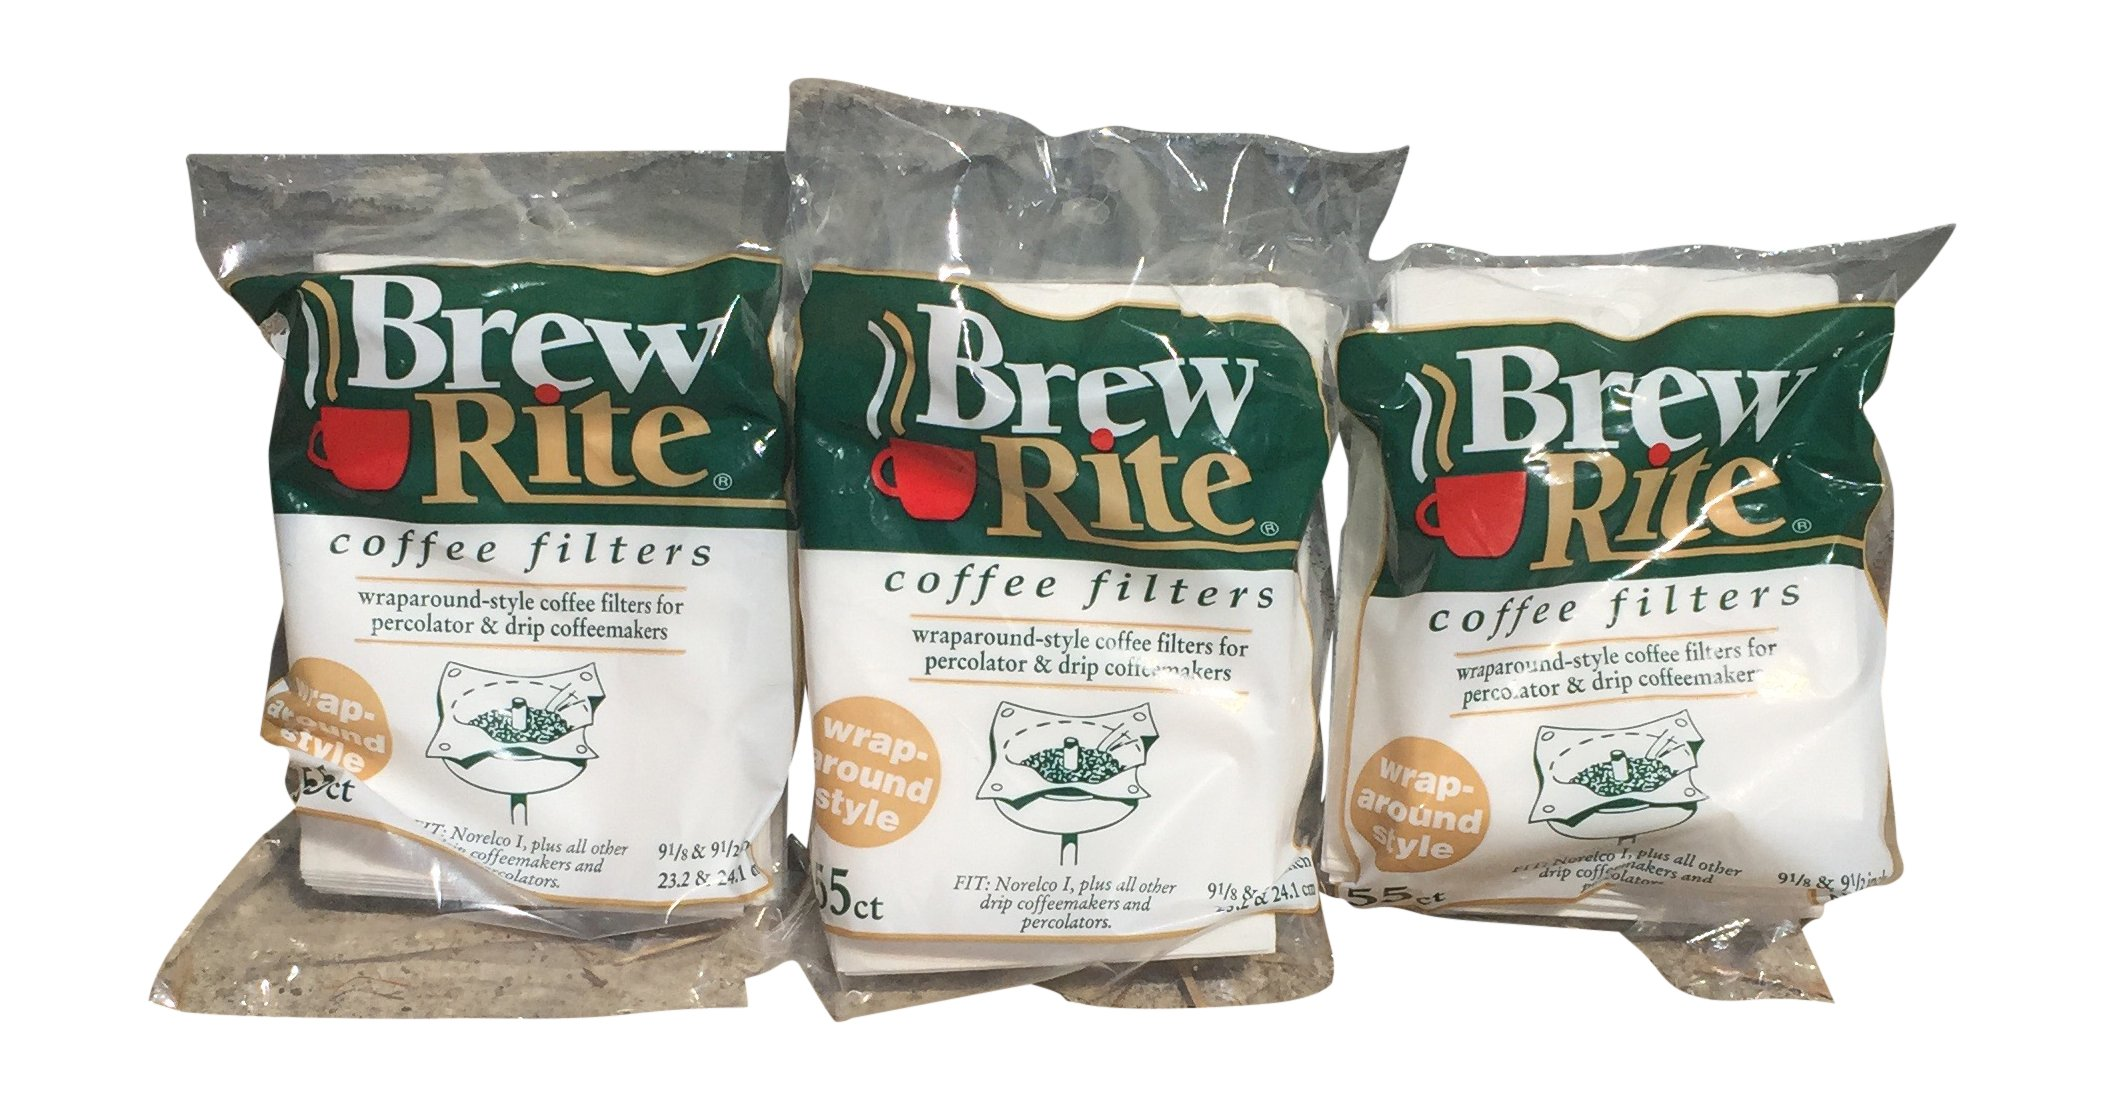 Brew Rite Rockline Wrap Around Percolator Coffee Filters (Pack of 3)